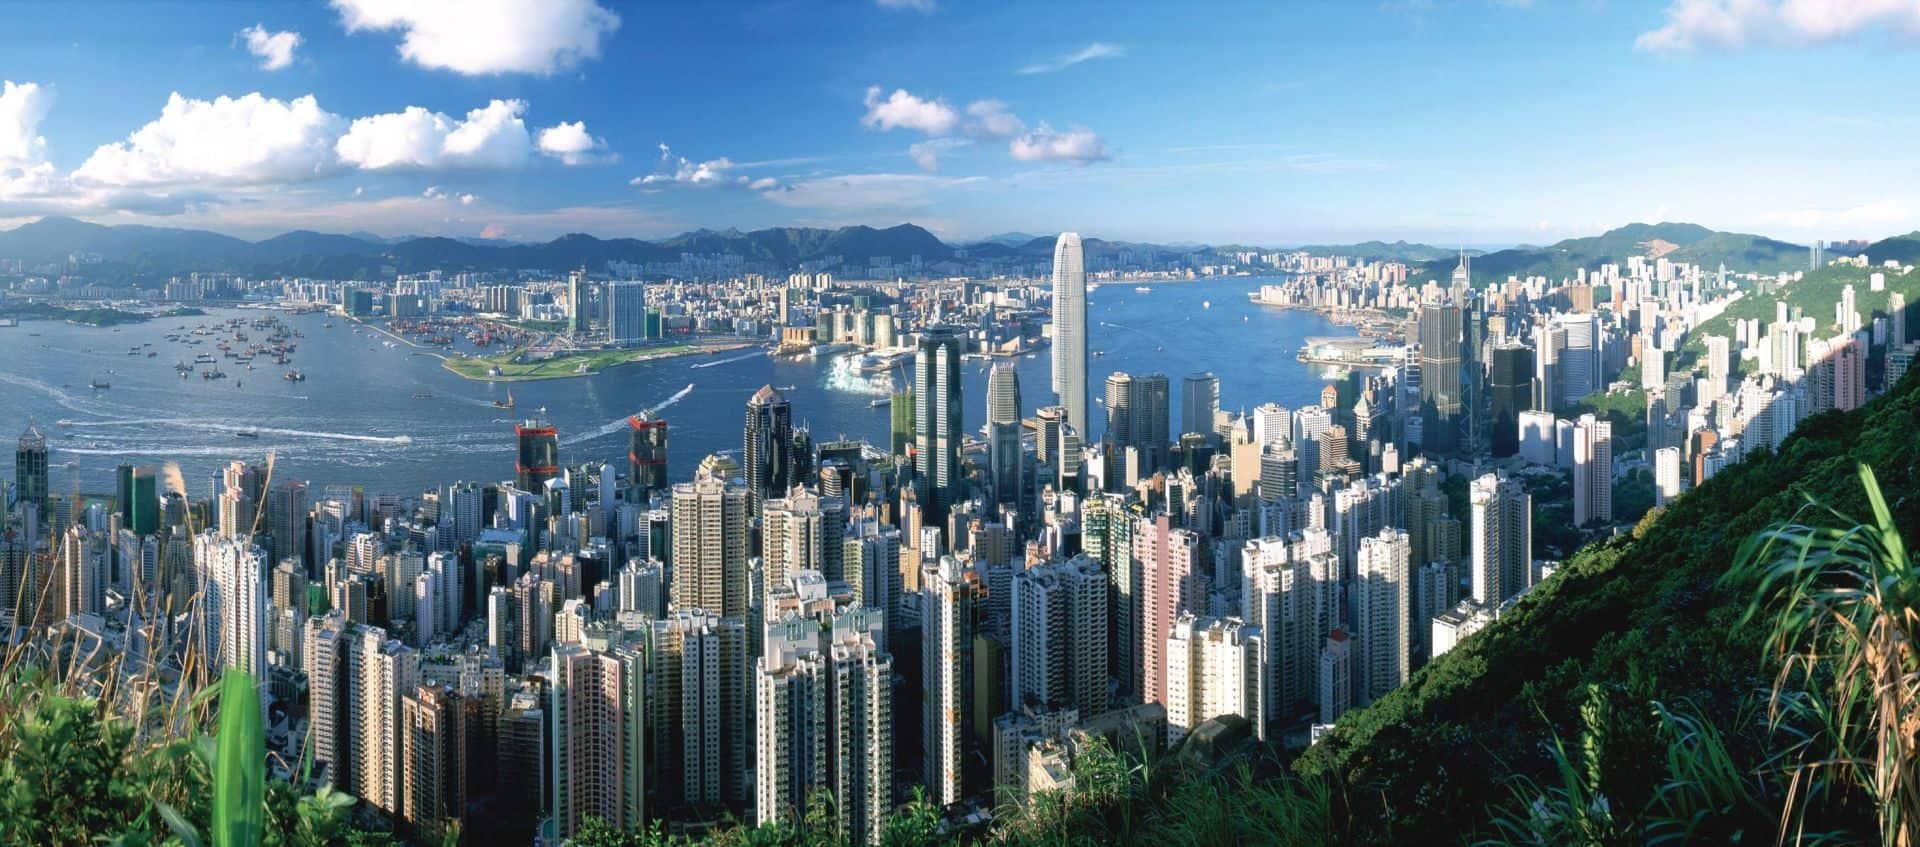 Victoria Peak View Hong Kong